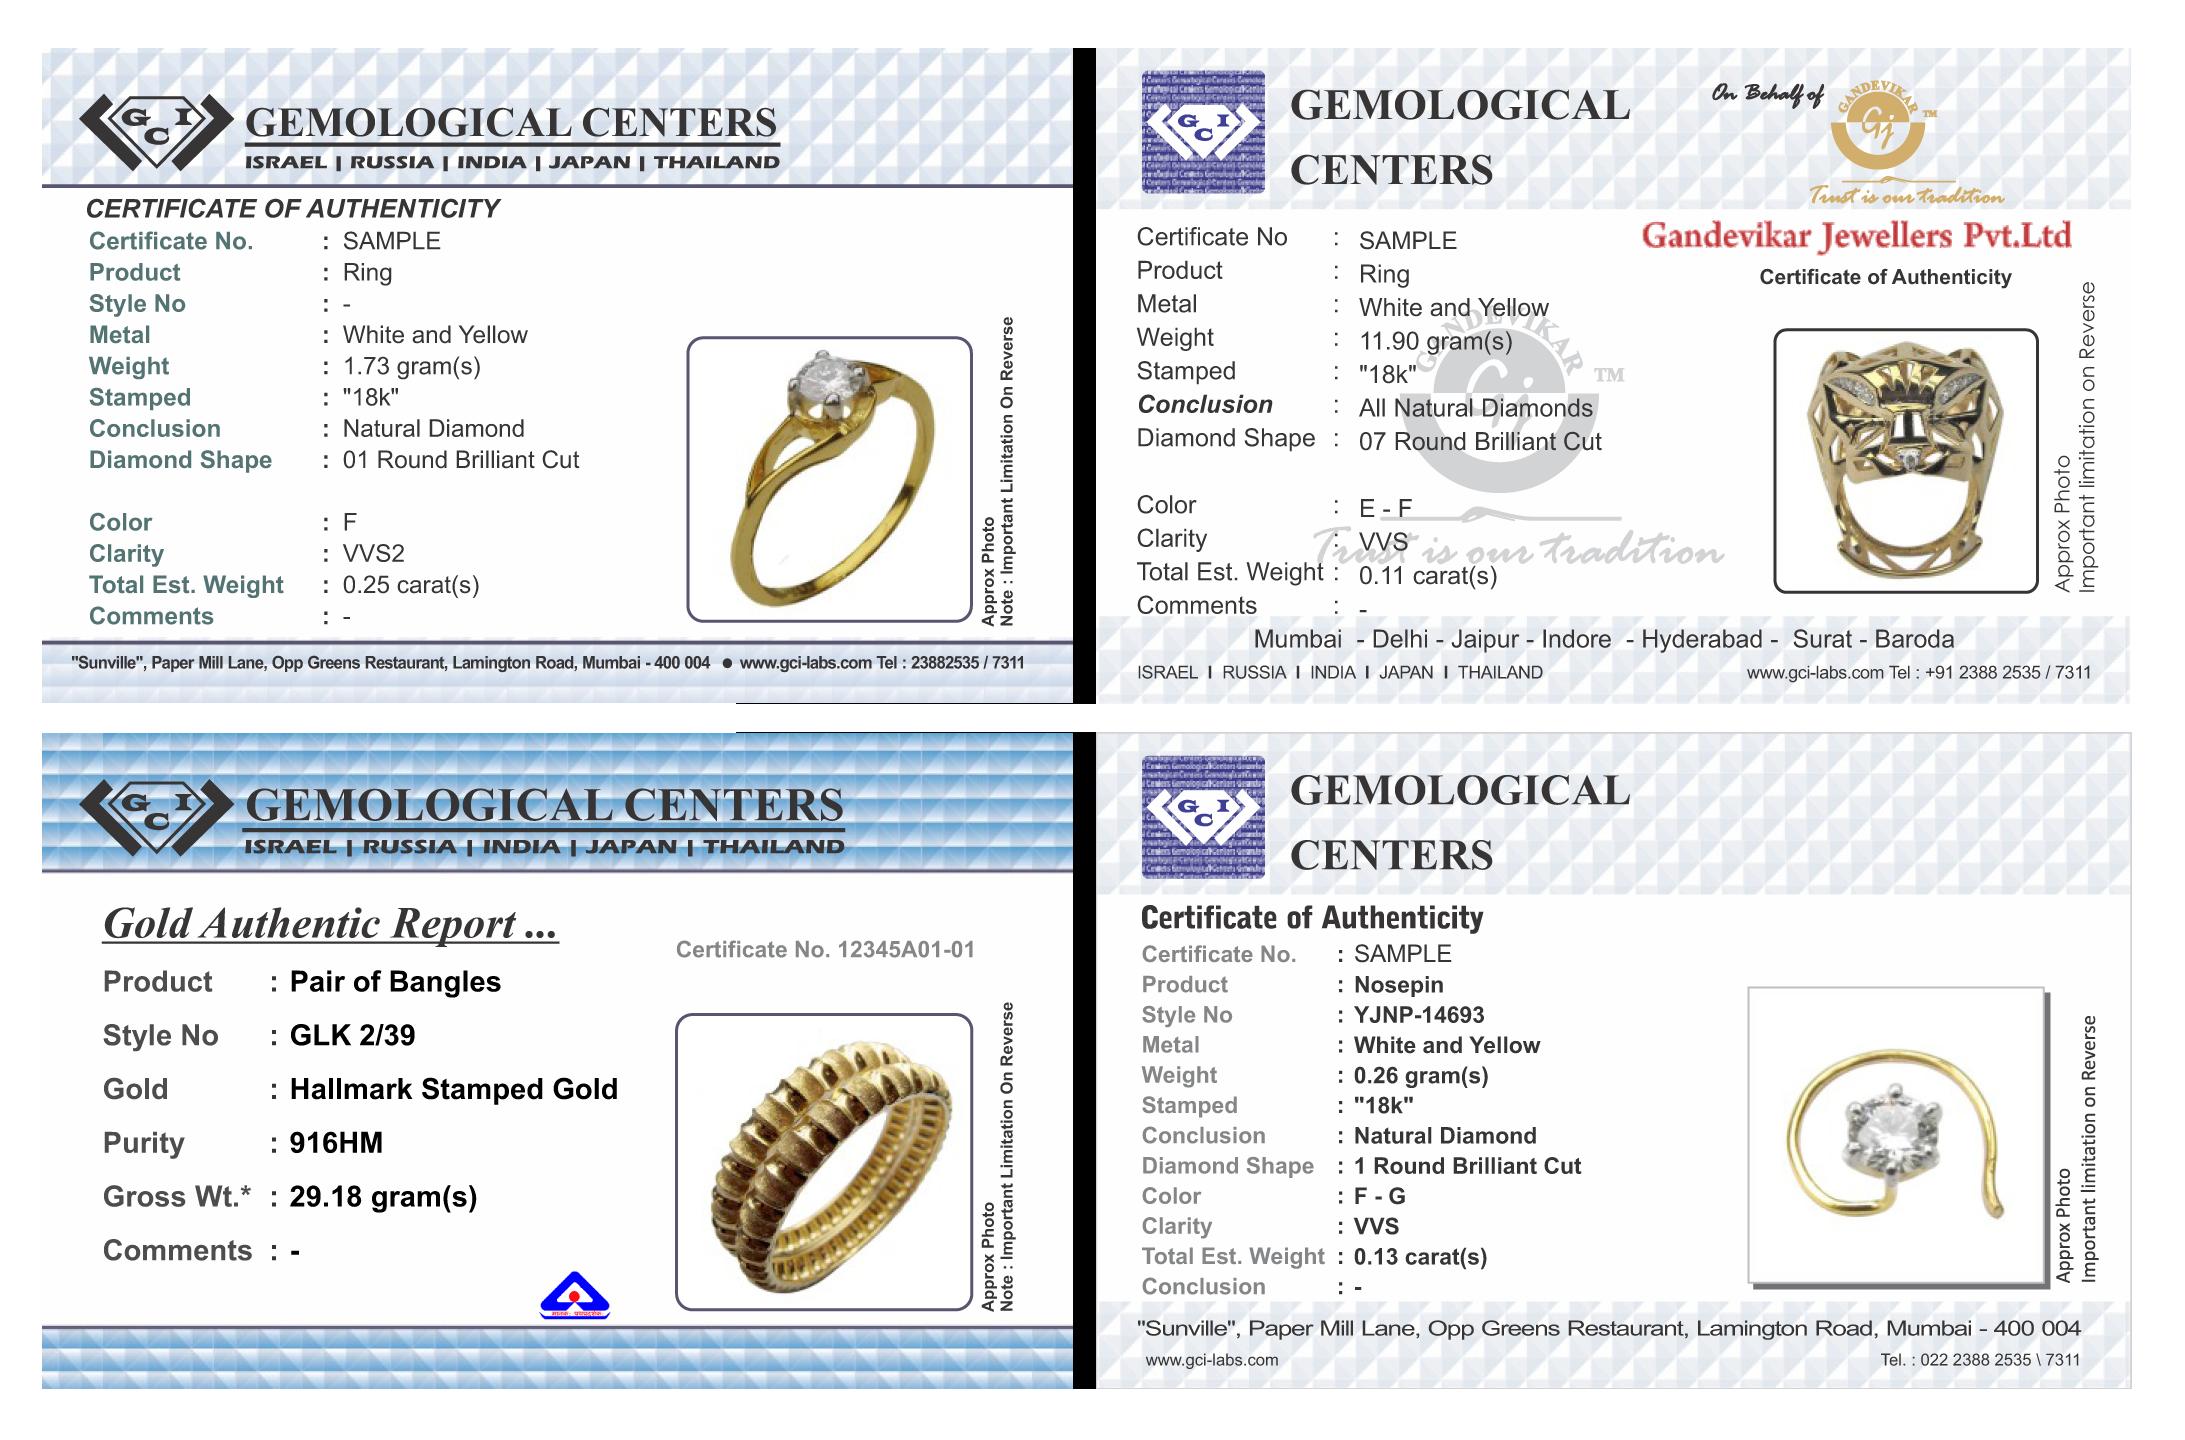 Gci jewllery certificate yadclub Gallery